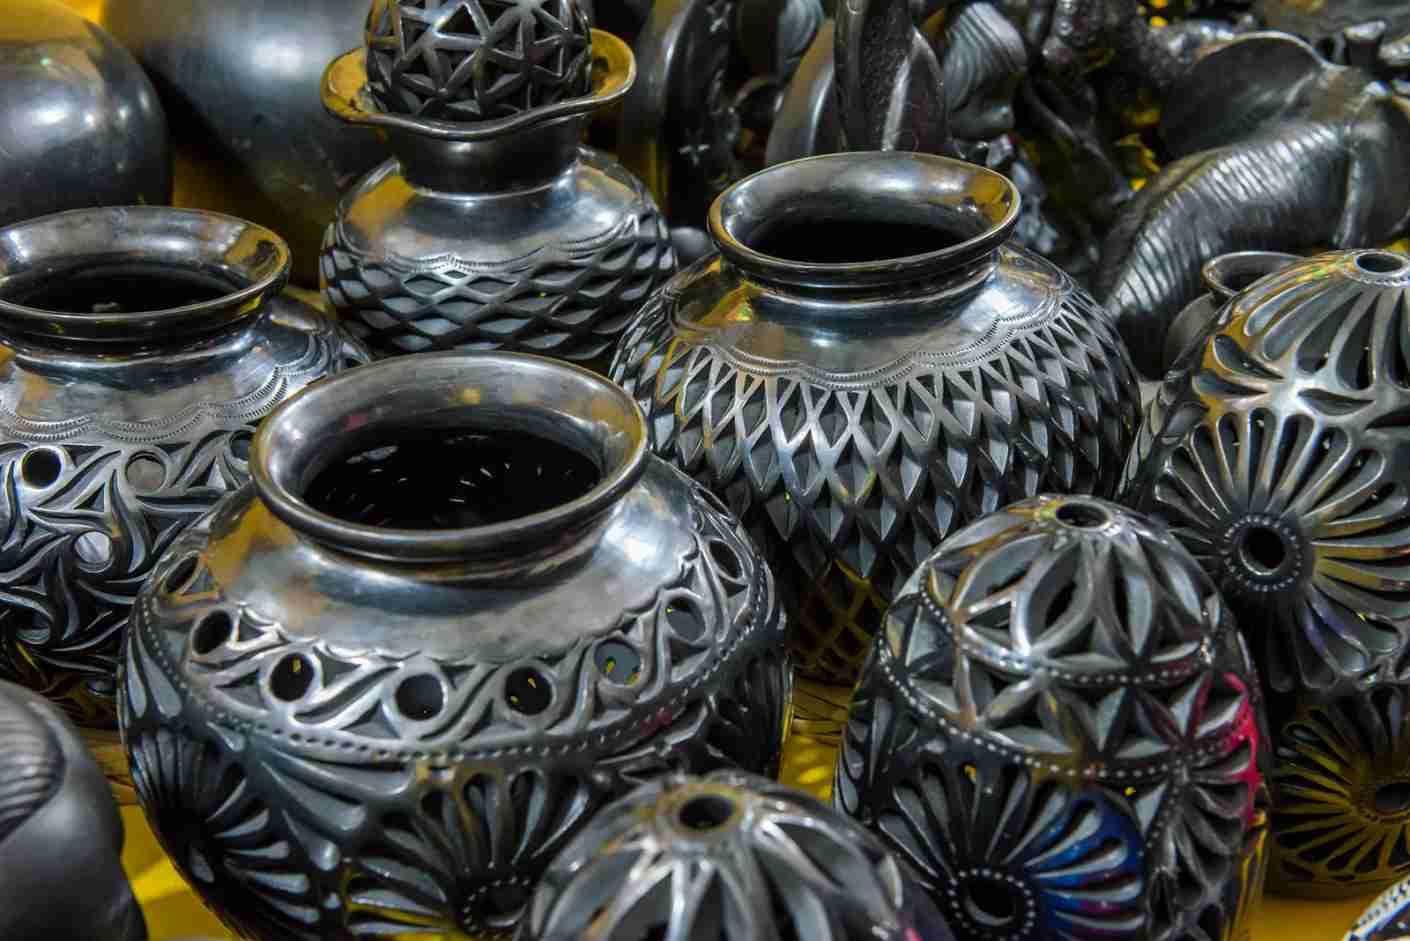 Barro Negro from Oaxacan Silver. (Photo by Vicy / Shutterstock)